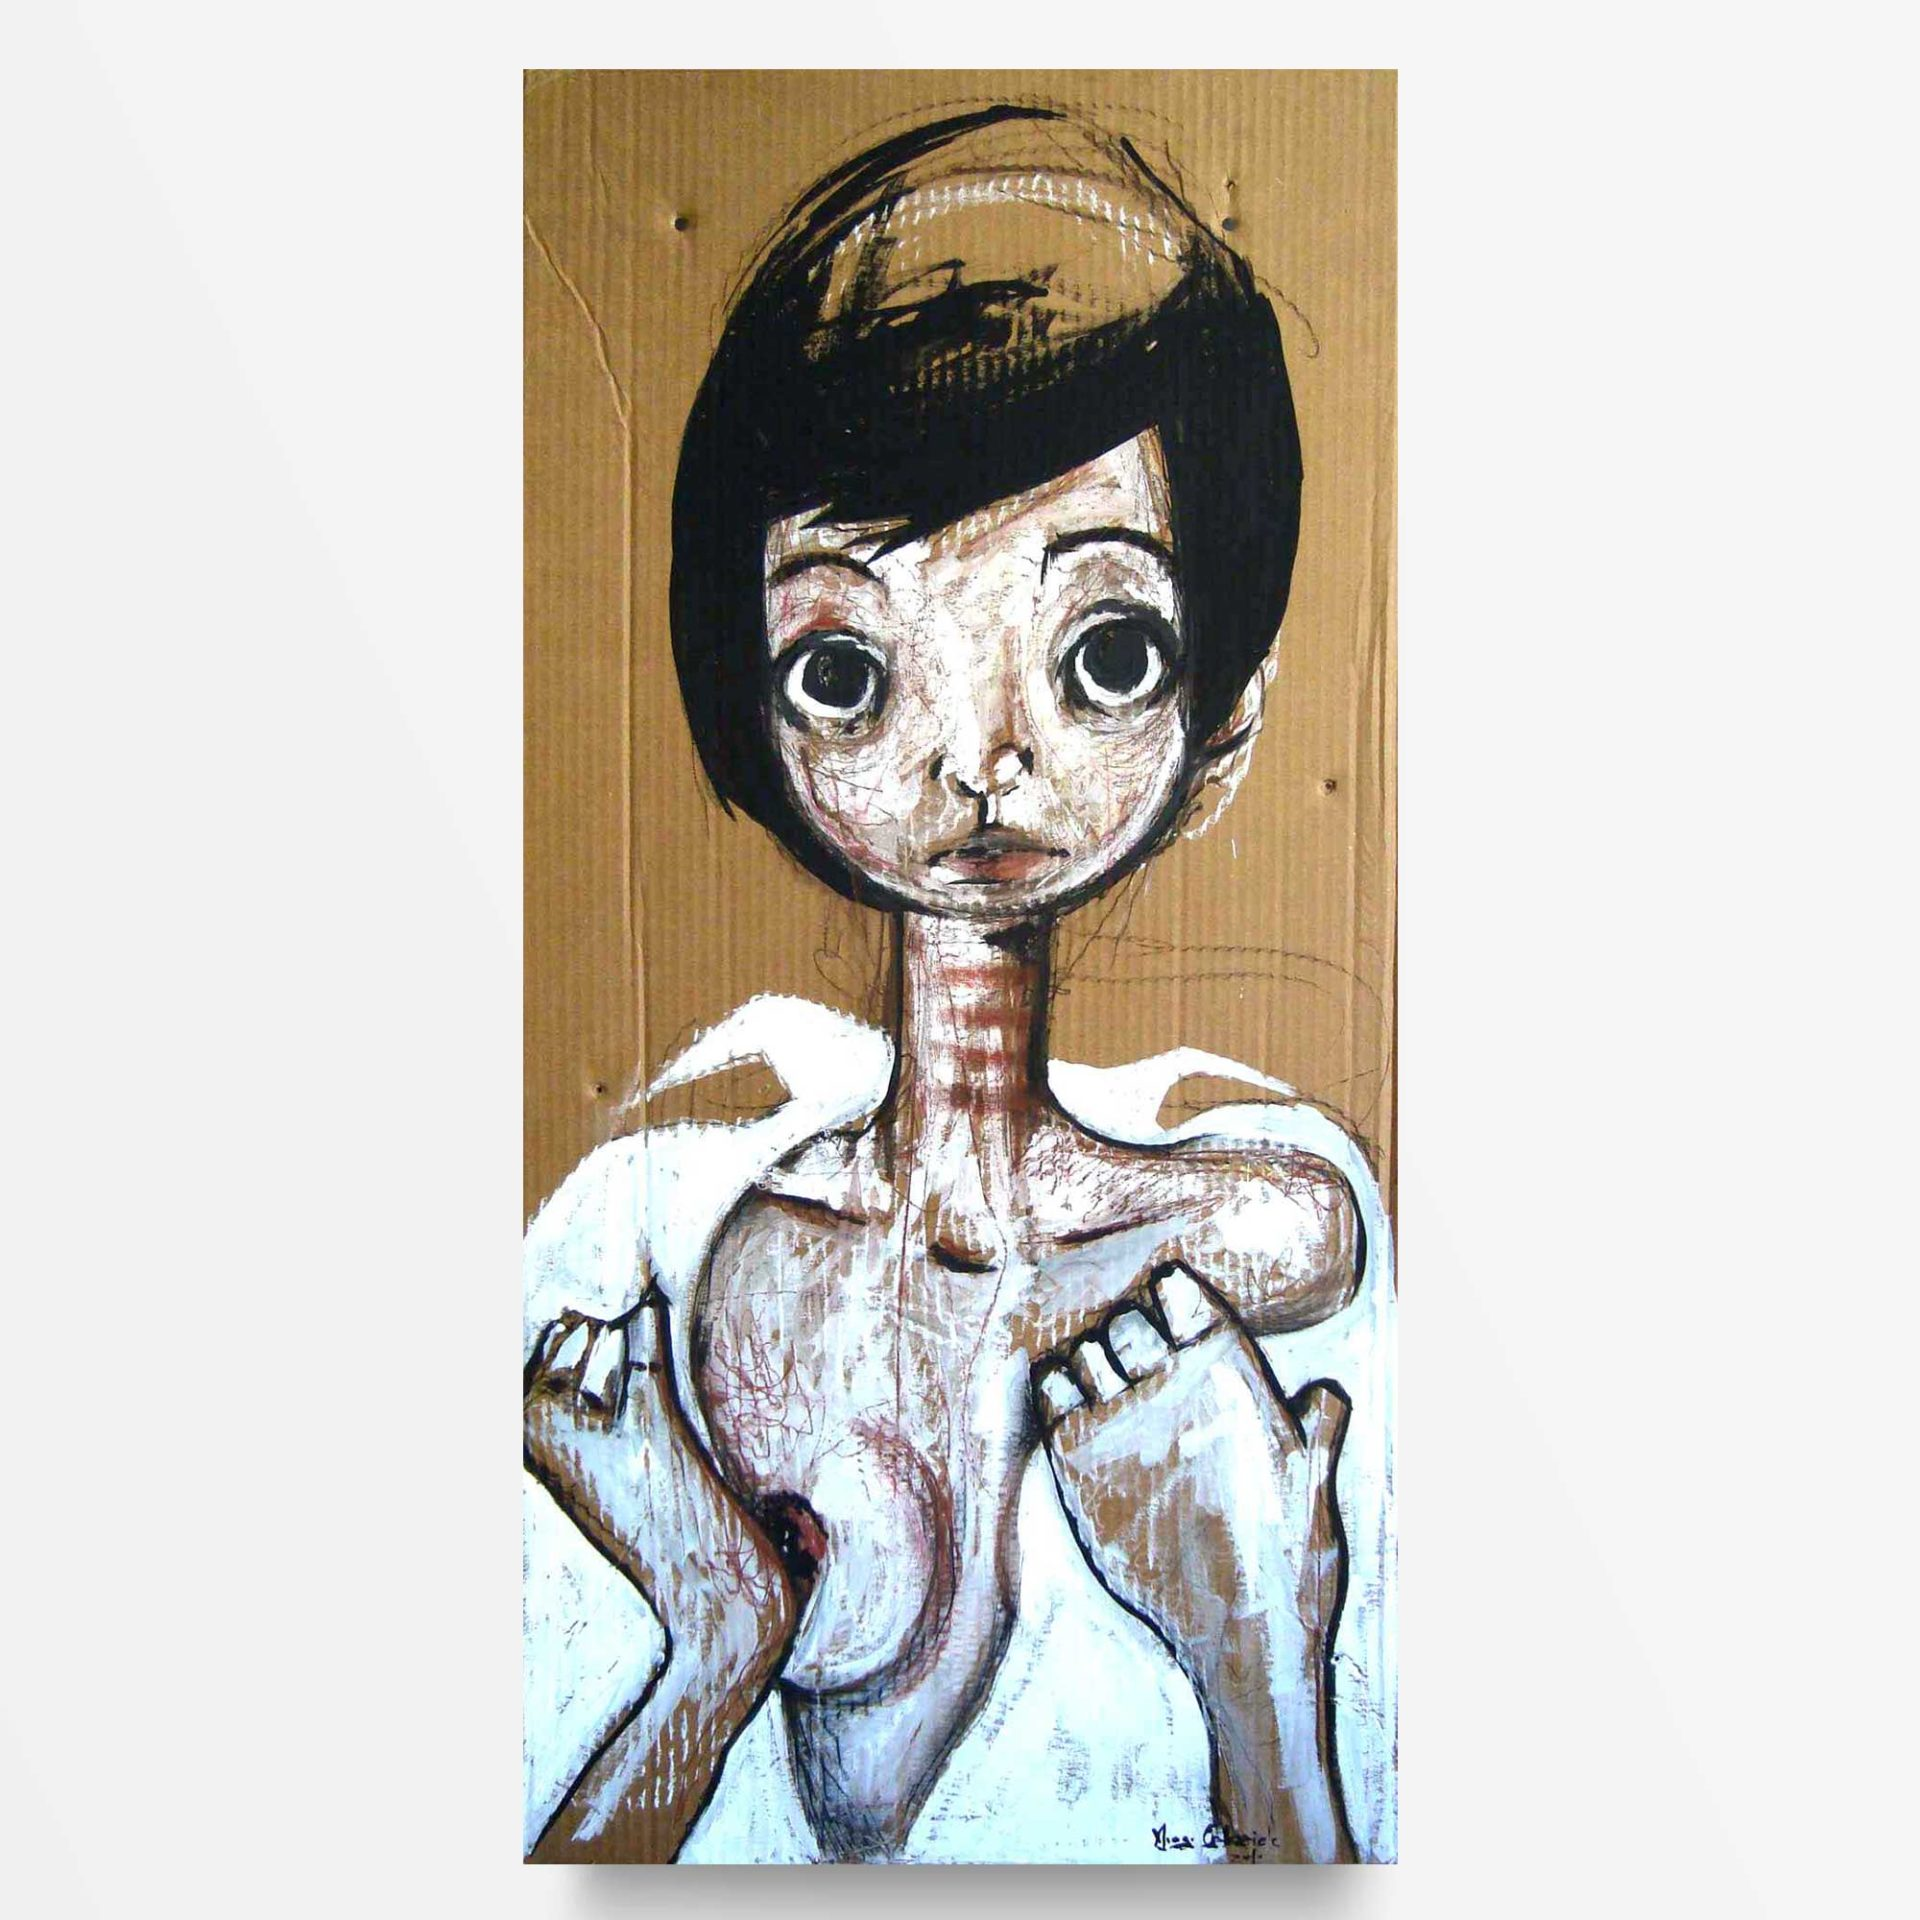 Lowbrow Art Ma sono nude Camicia bianca quadro ad acrilico Diego Gabriele